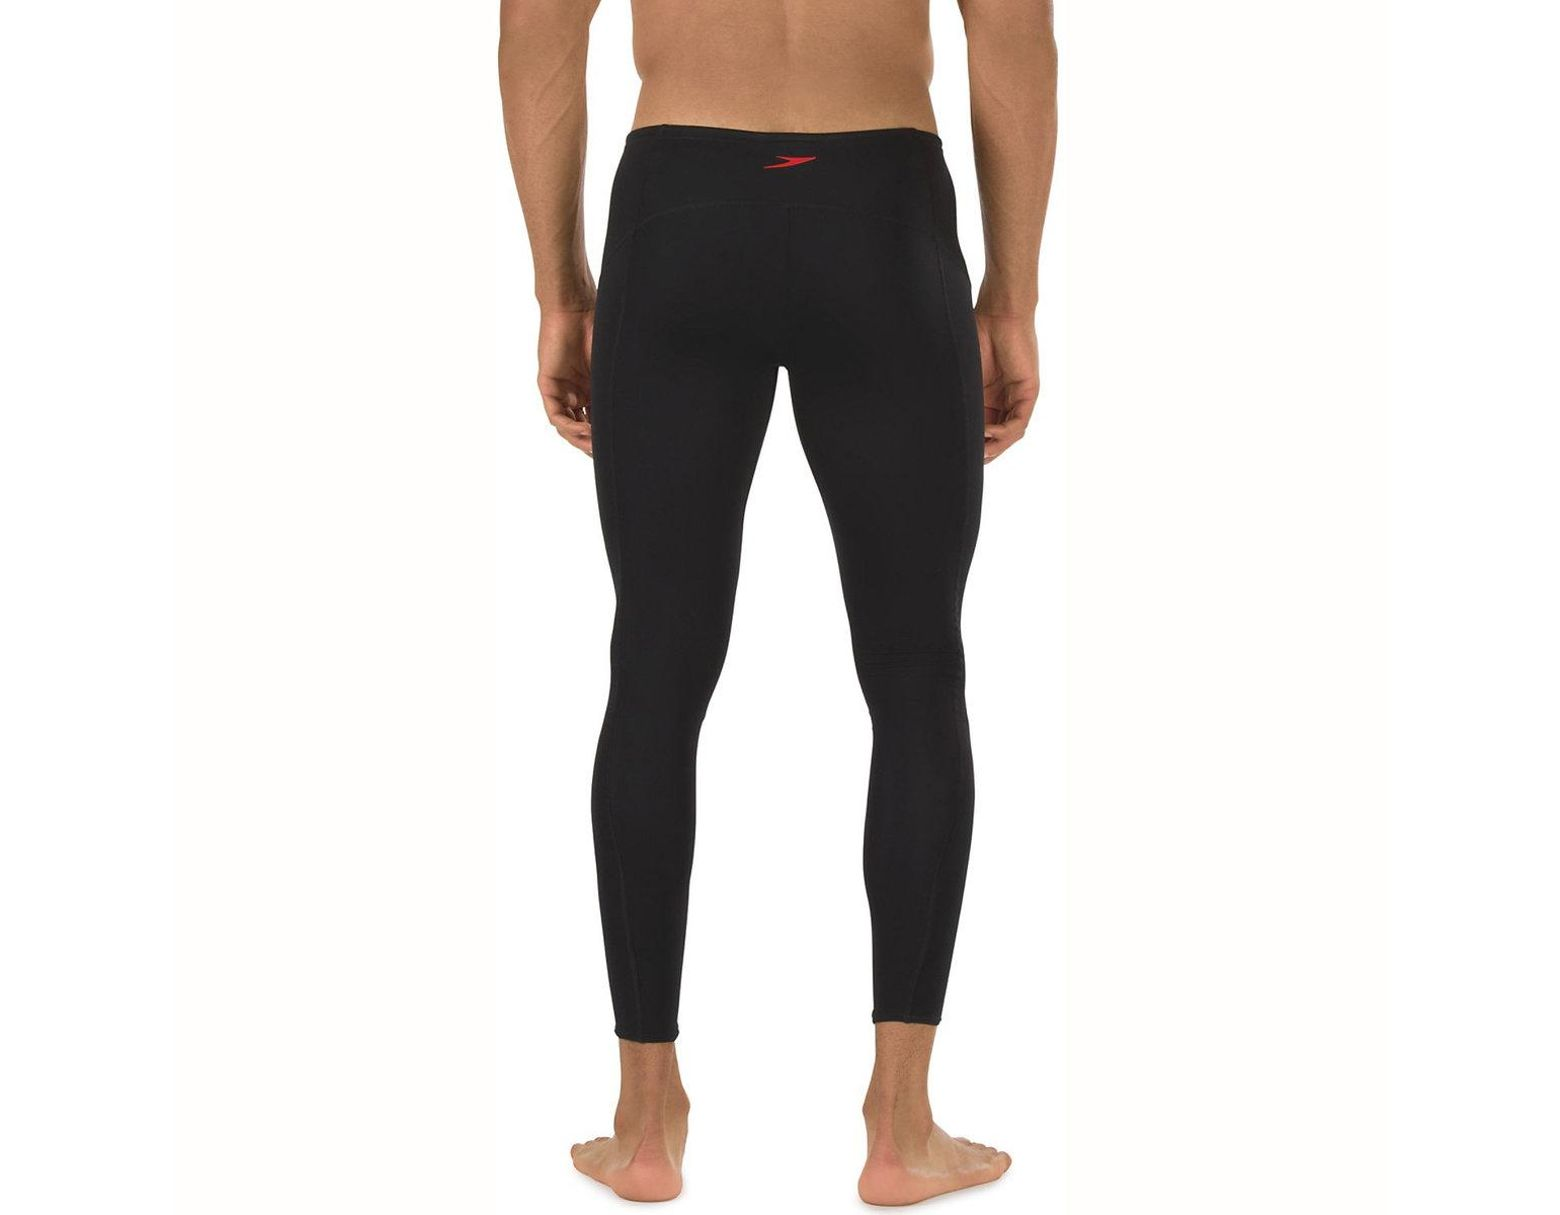 52144852a2ef4 Speedo Fitness Endurance+ Compression LEGGINGS in Black for Men - Lyst